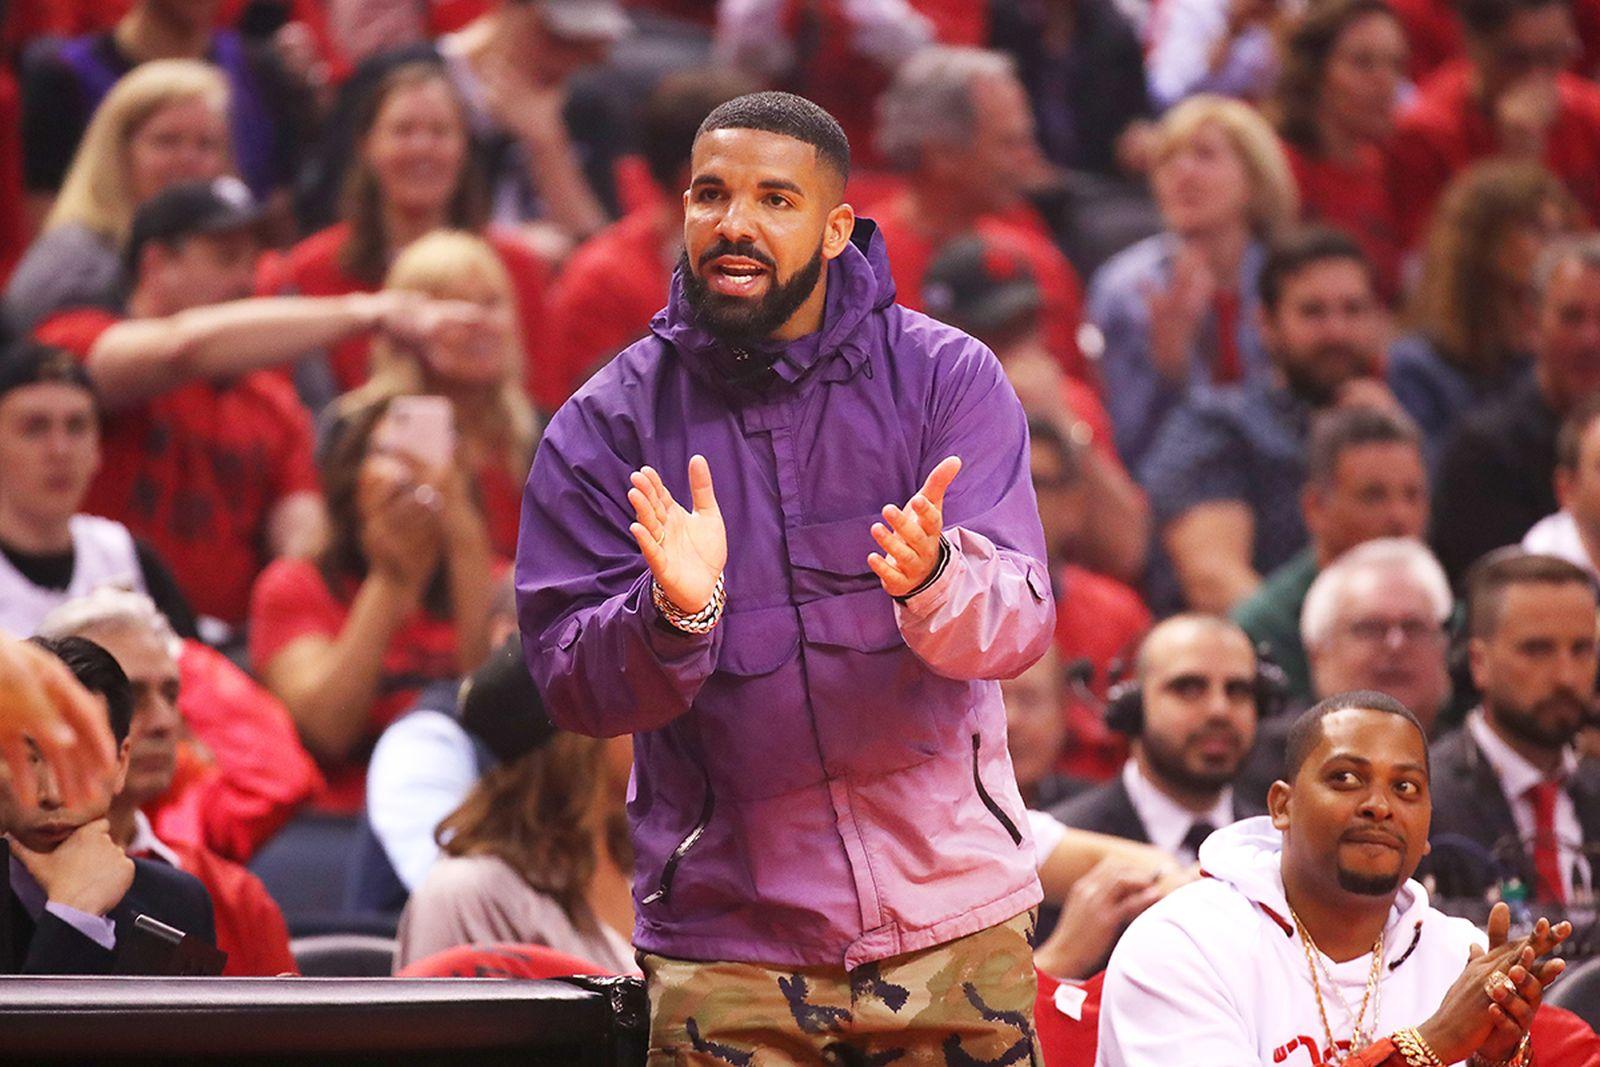 Drake NBA game courtside